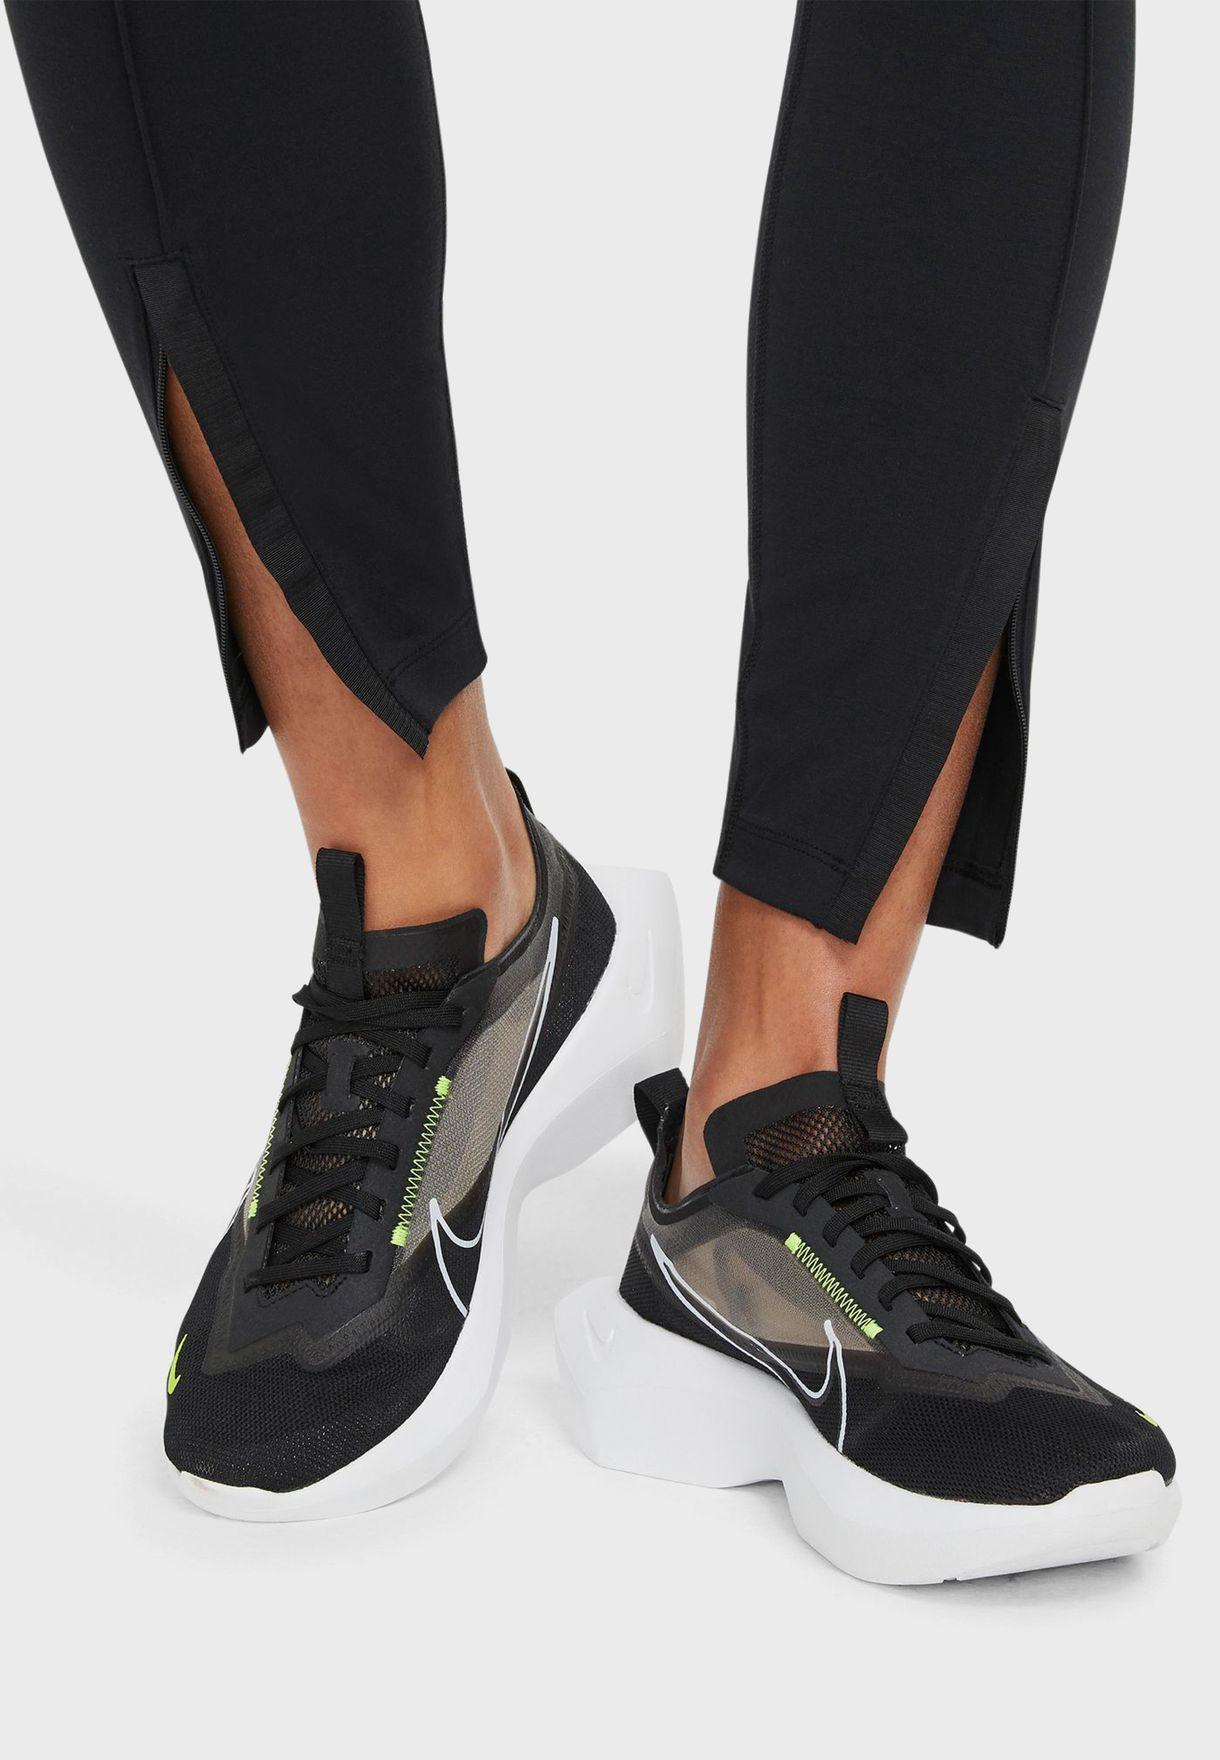 NSW Leg-A-See Leggings